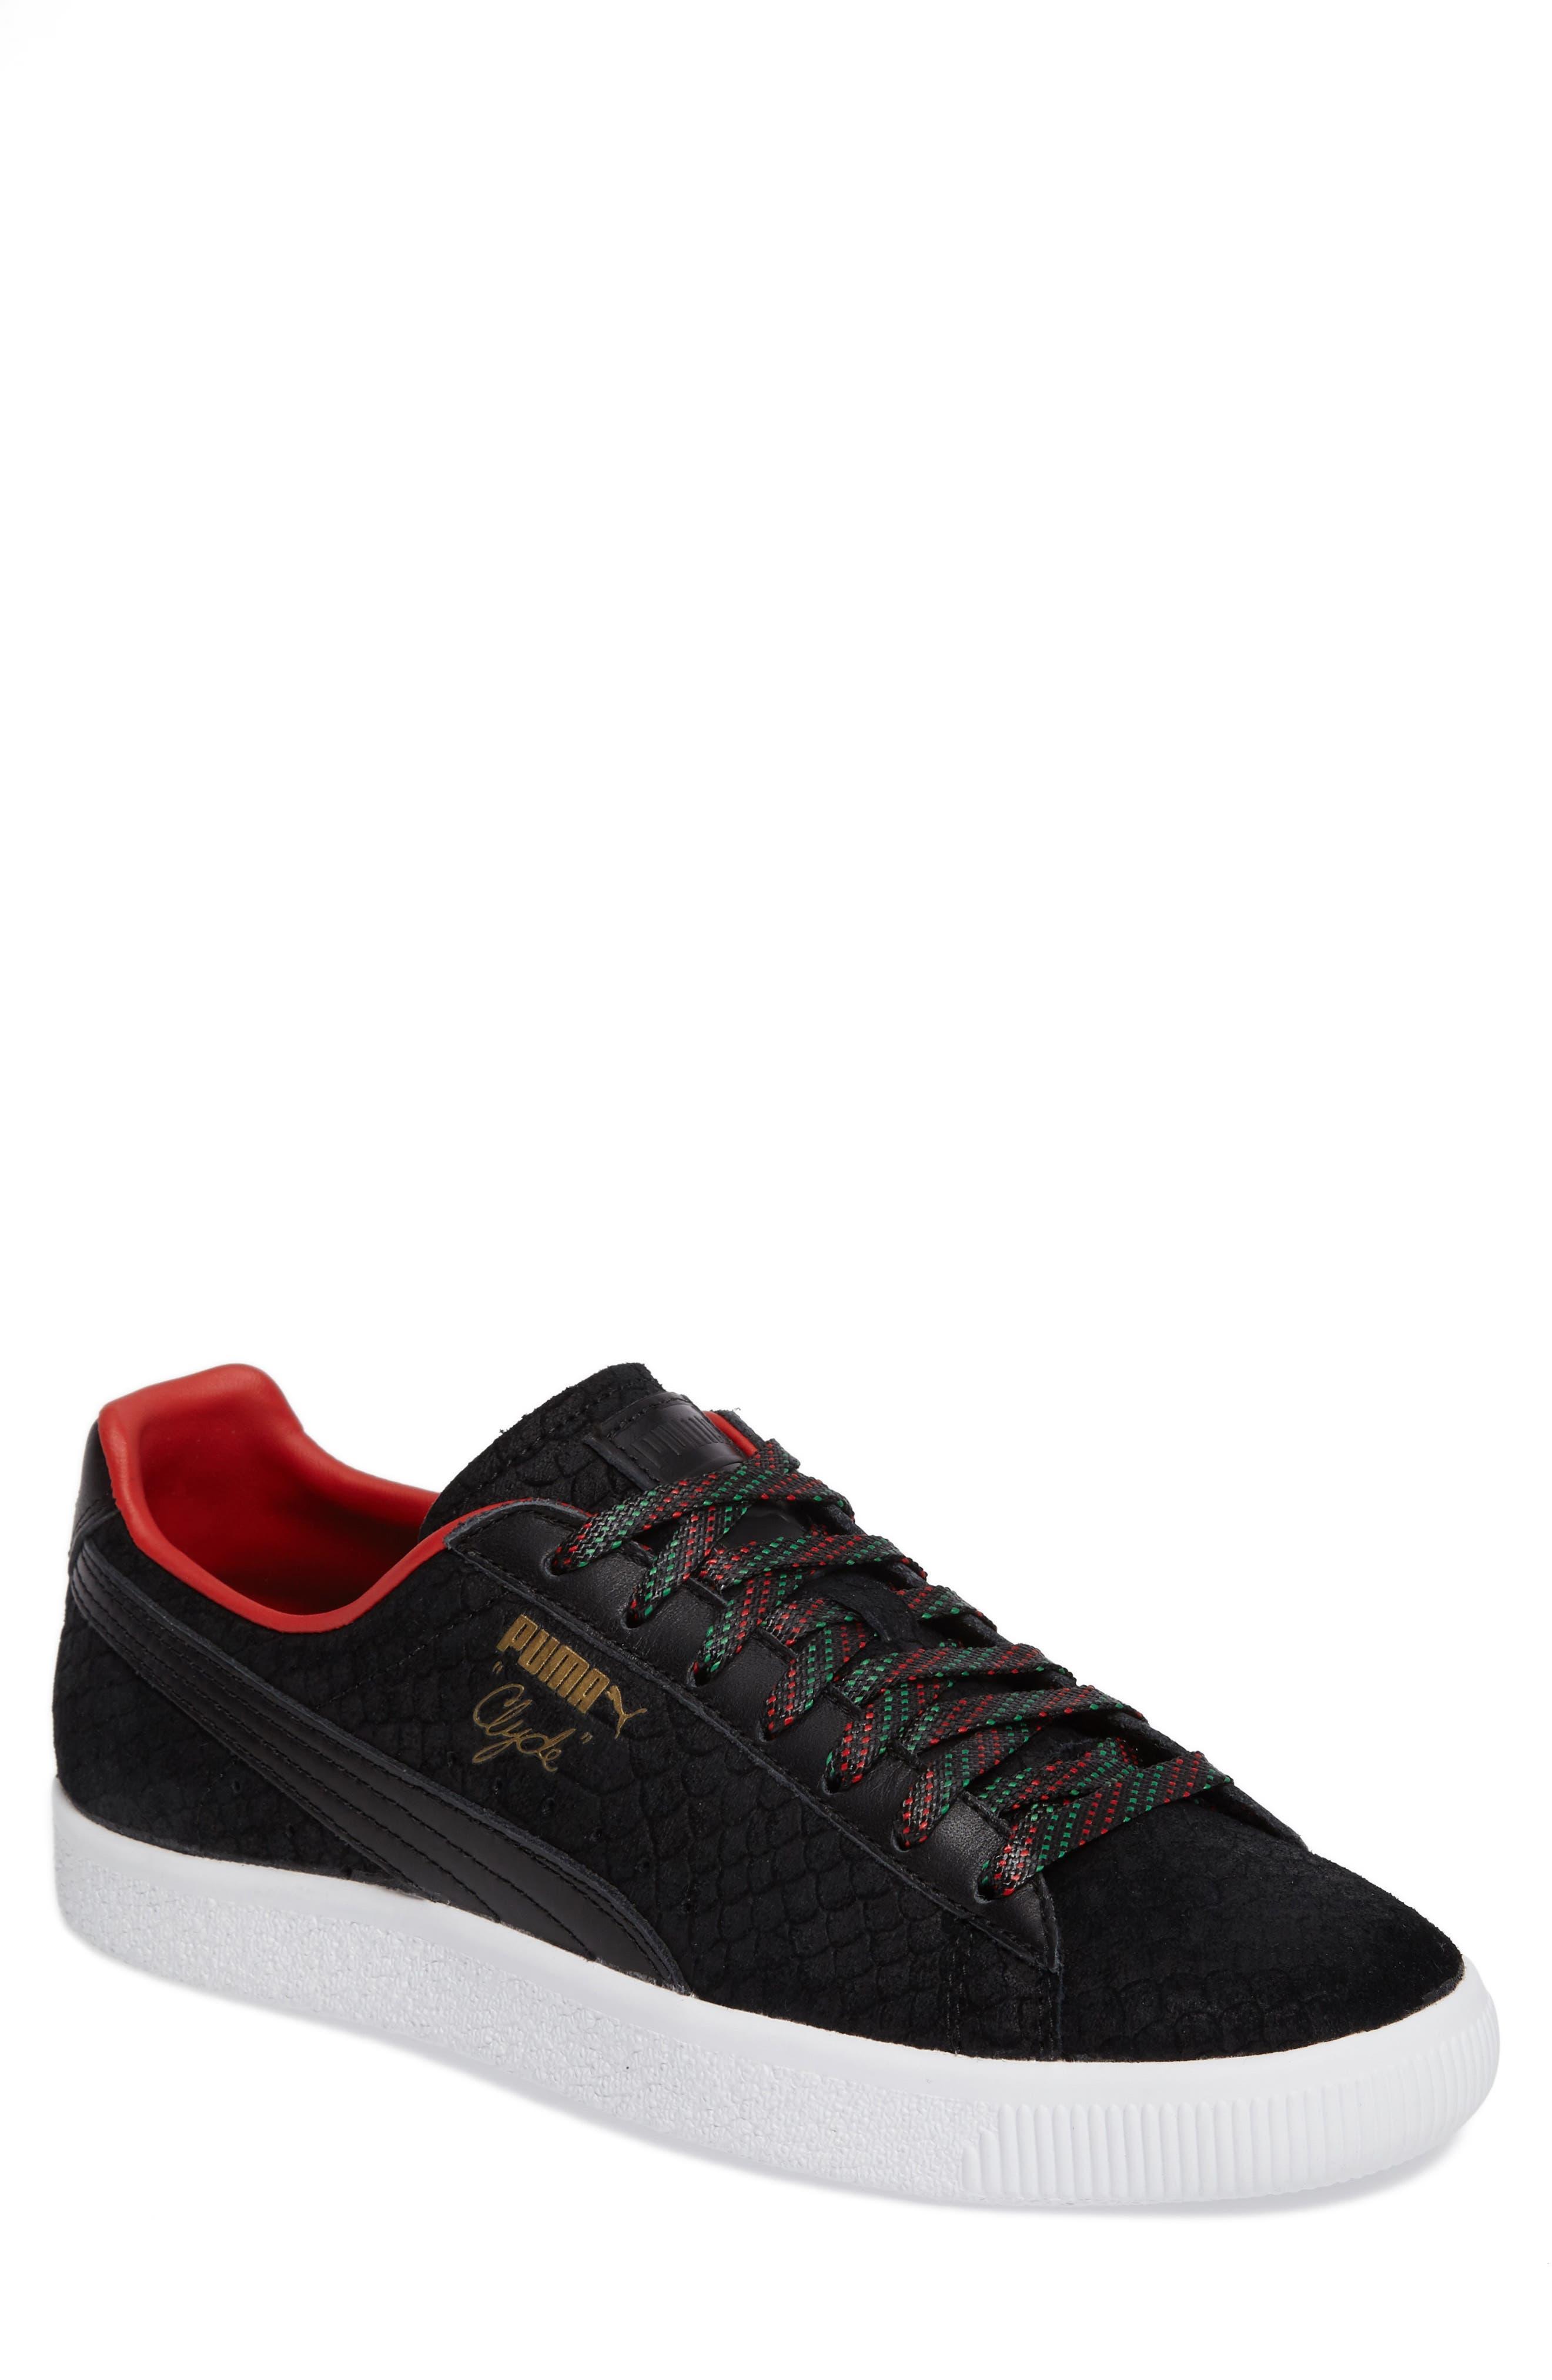 Clyde GCC Sneaker, Main, color, 001